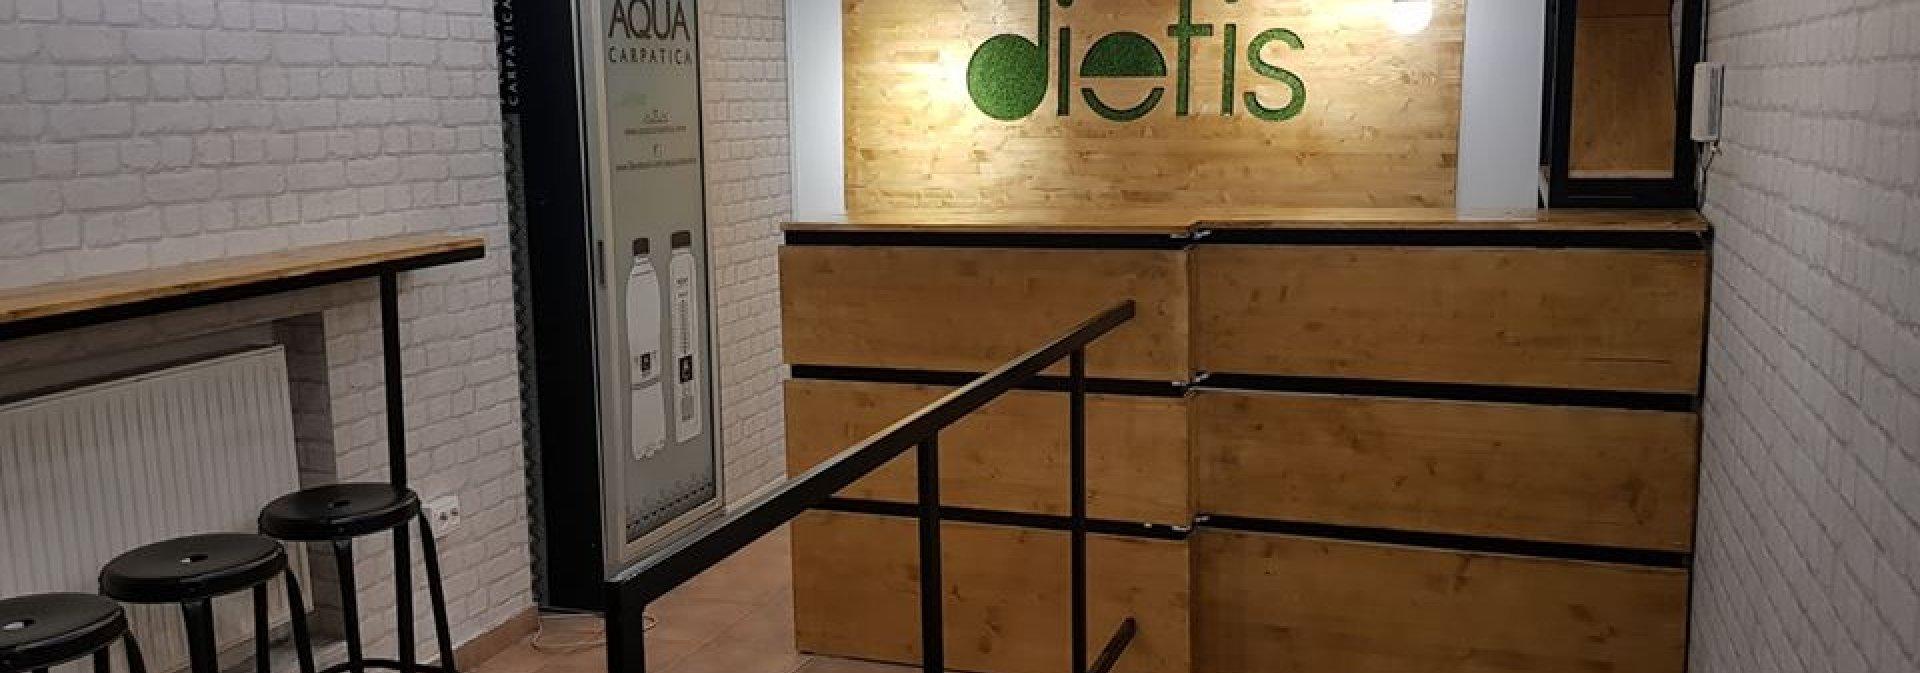 Dietis Gym (Piața Unirii), Iași